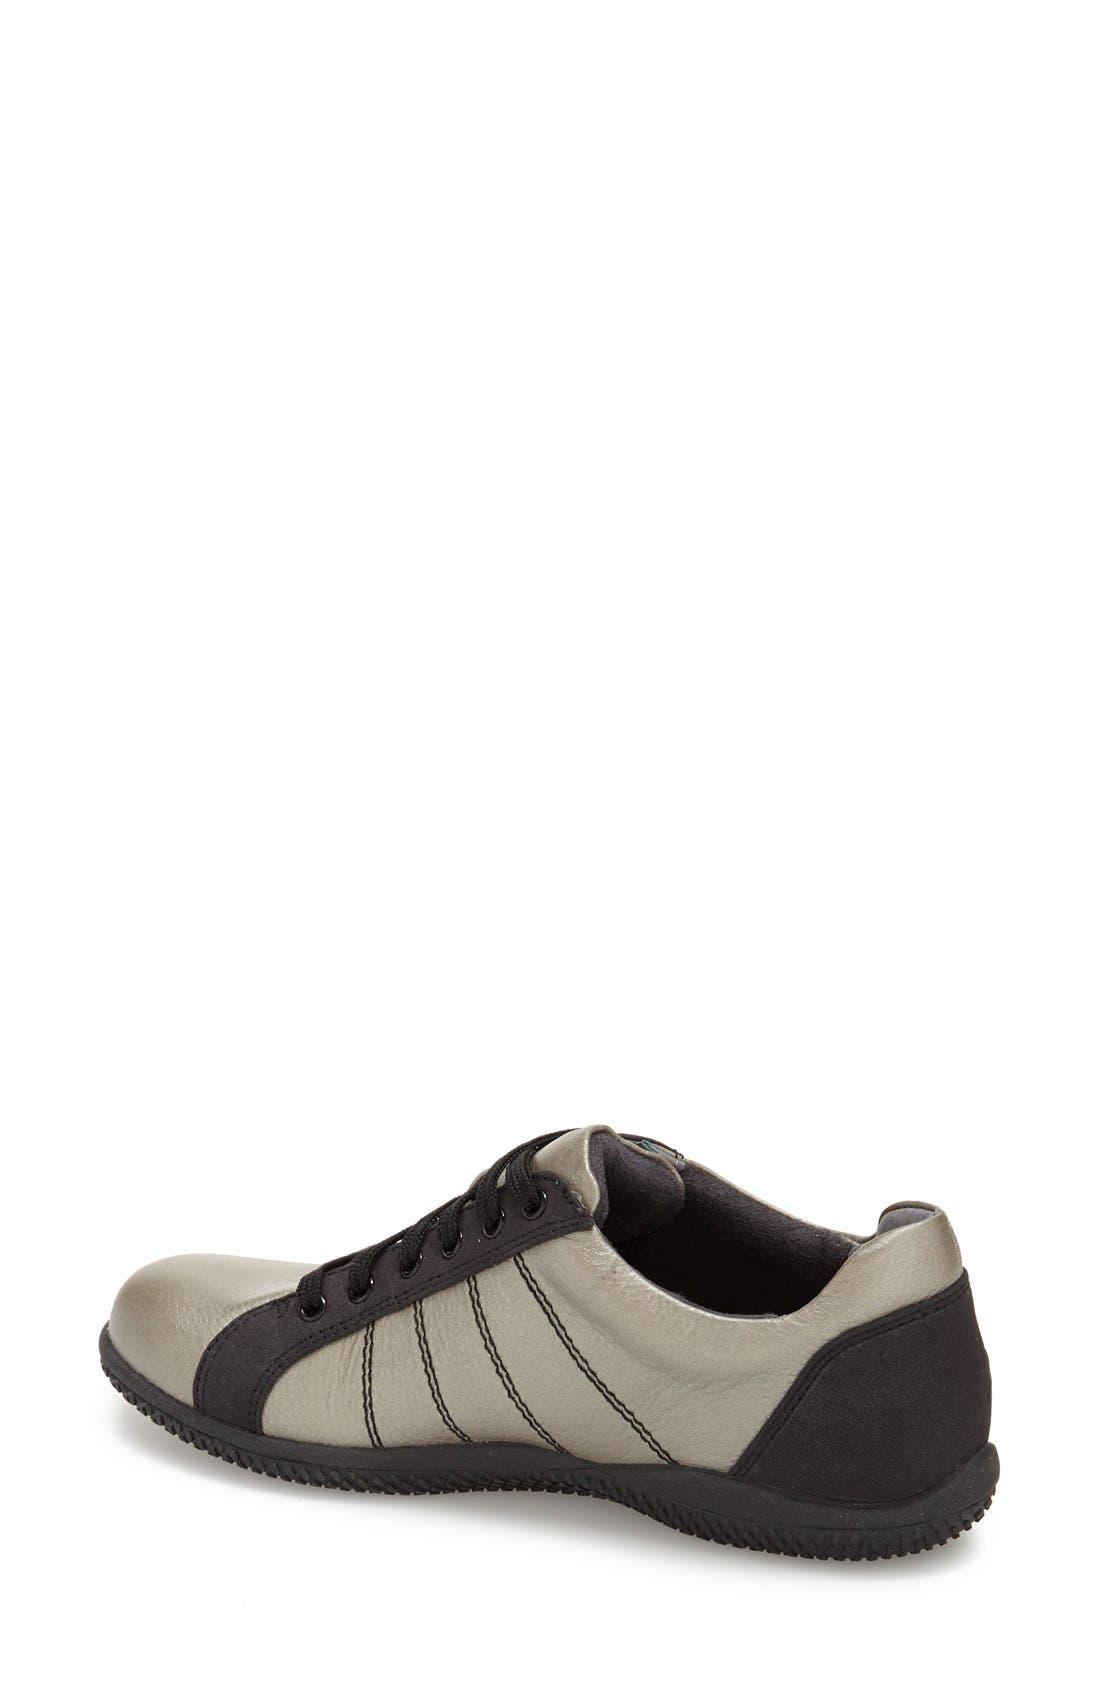 'Hickory' Sneaker,                             Alternate thumbnail 6, color,